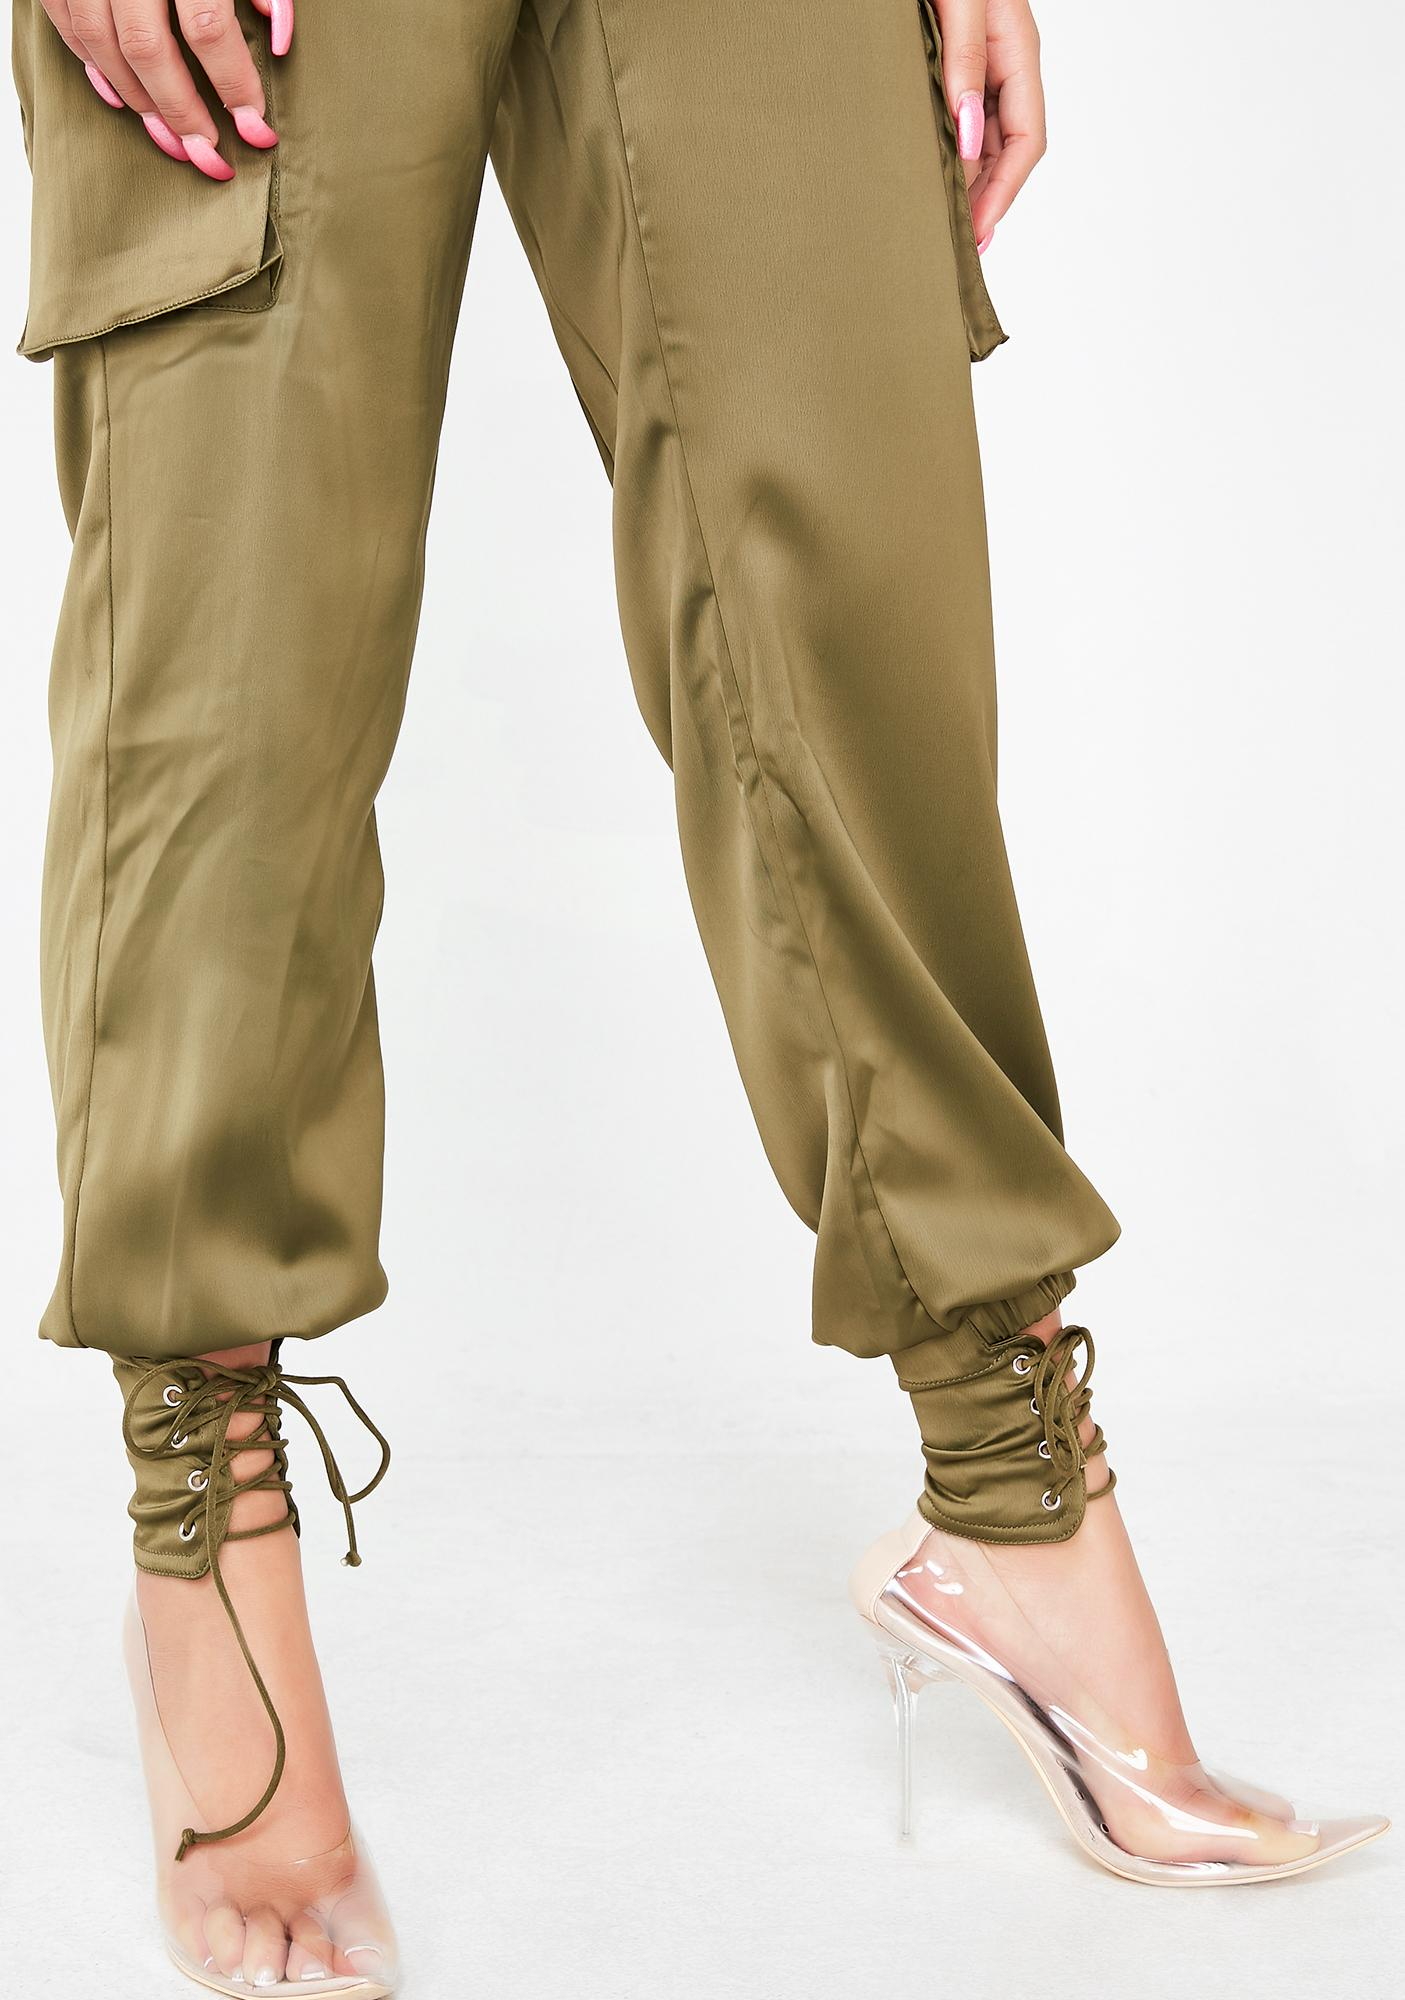 Kush No Need Cargo Pants